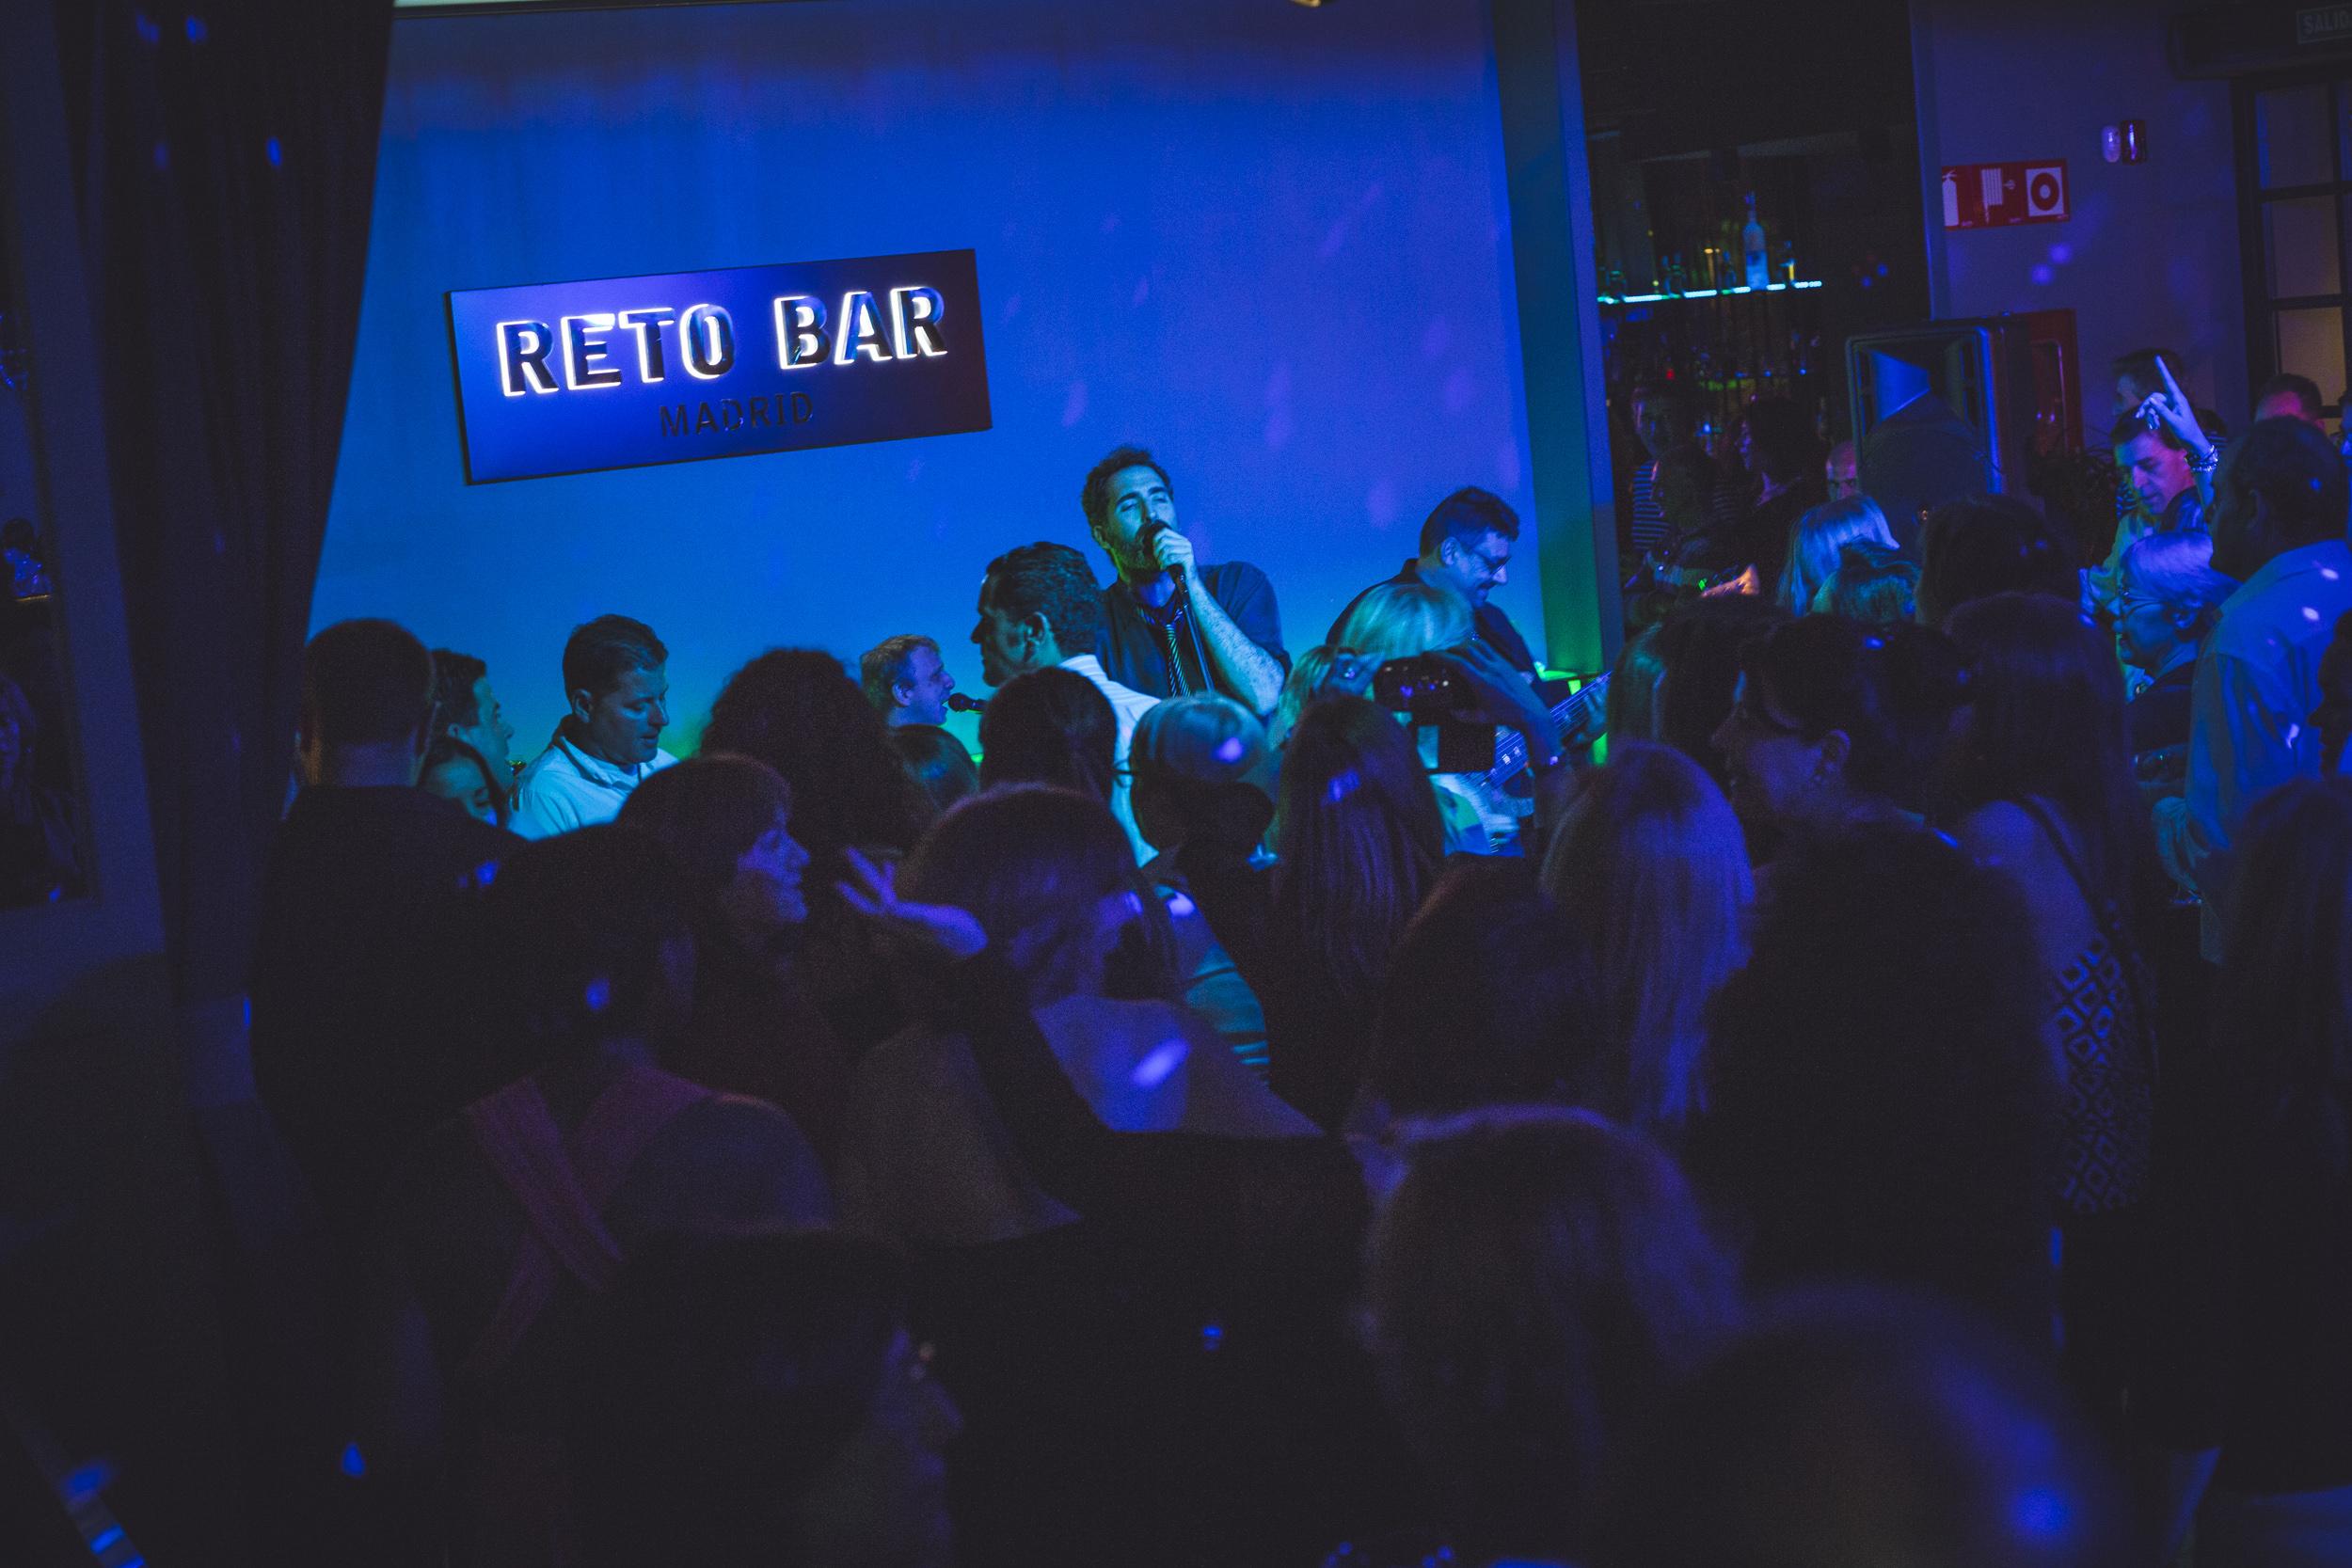 11-03 Reto bar-12